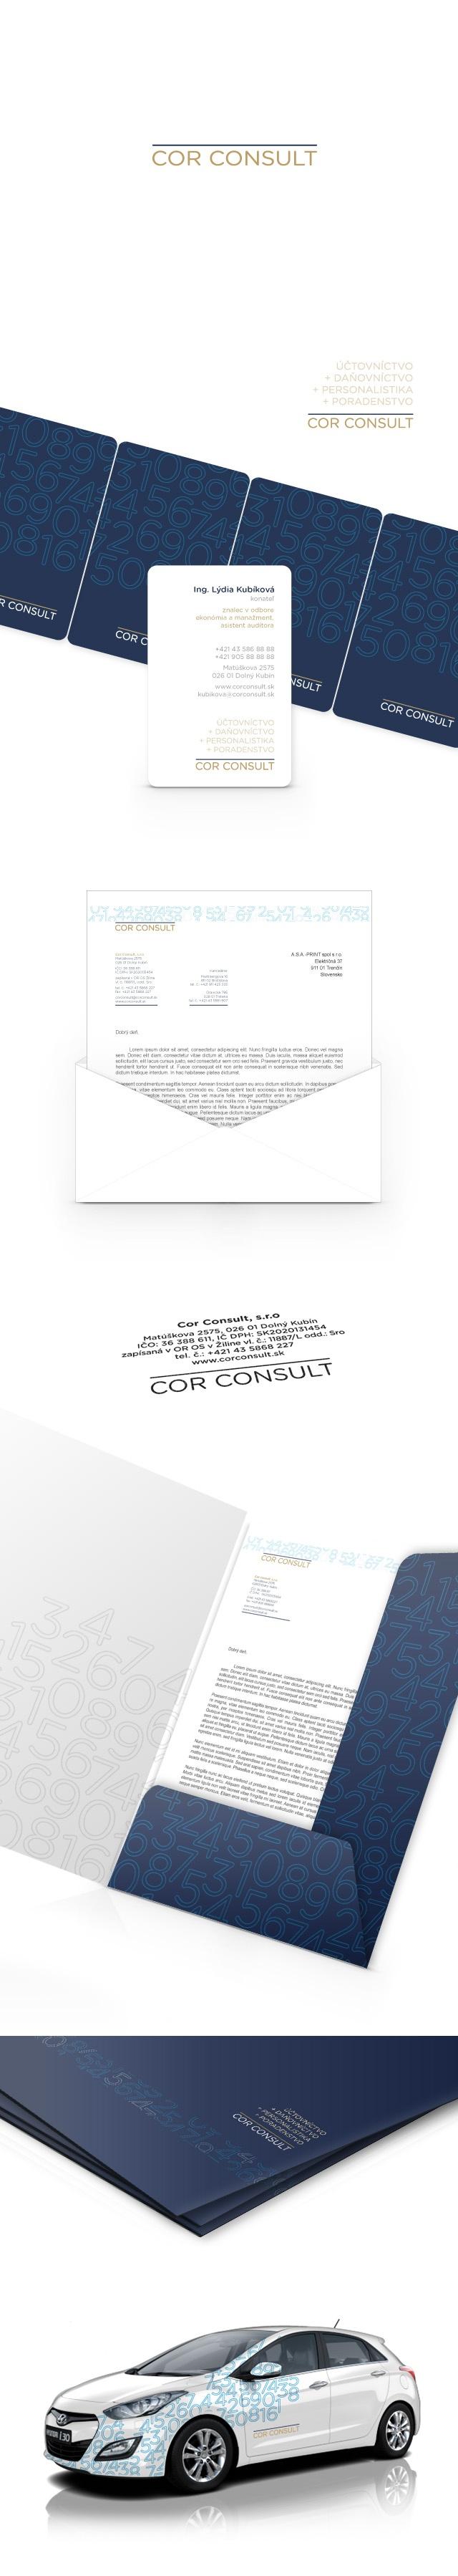 Cor Consult - účtovníctvo & daňovníctvo